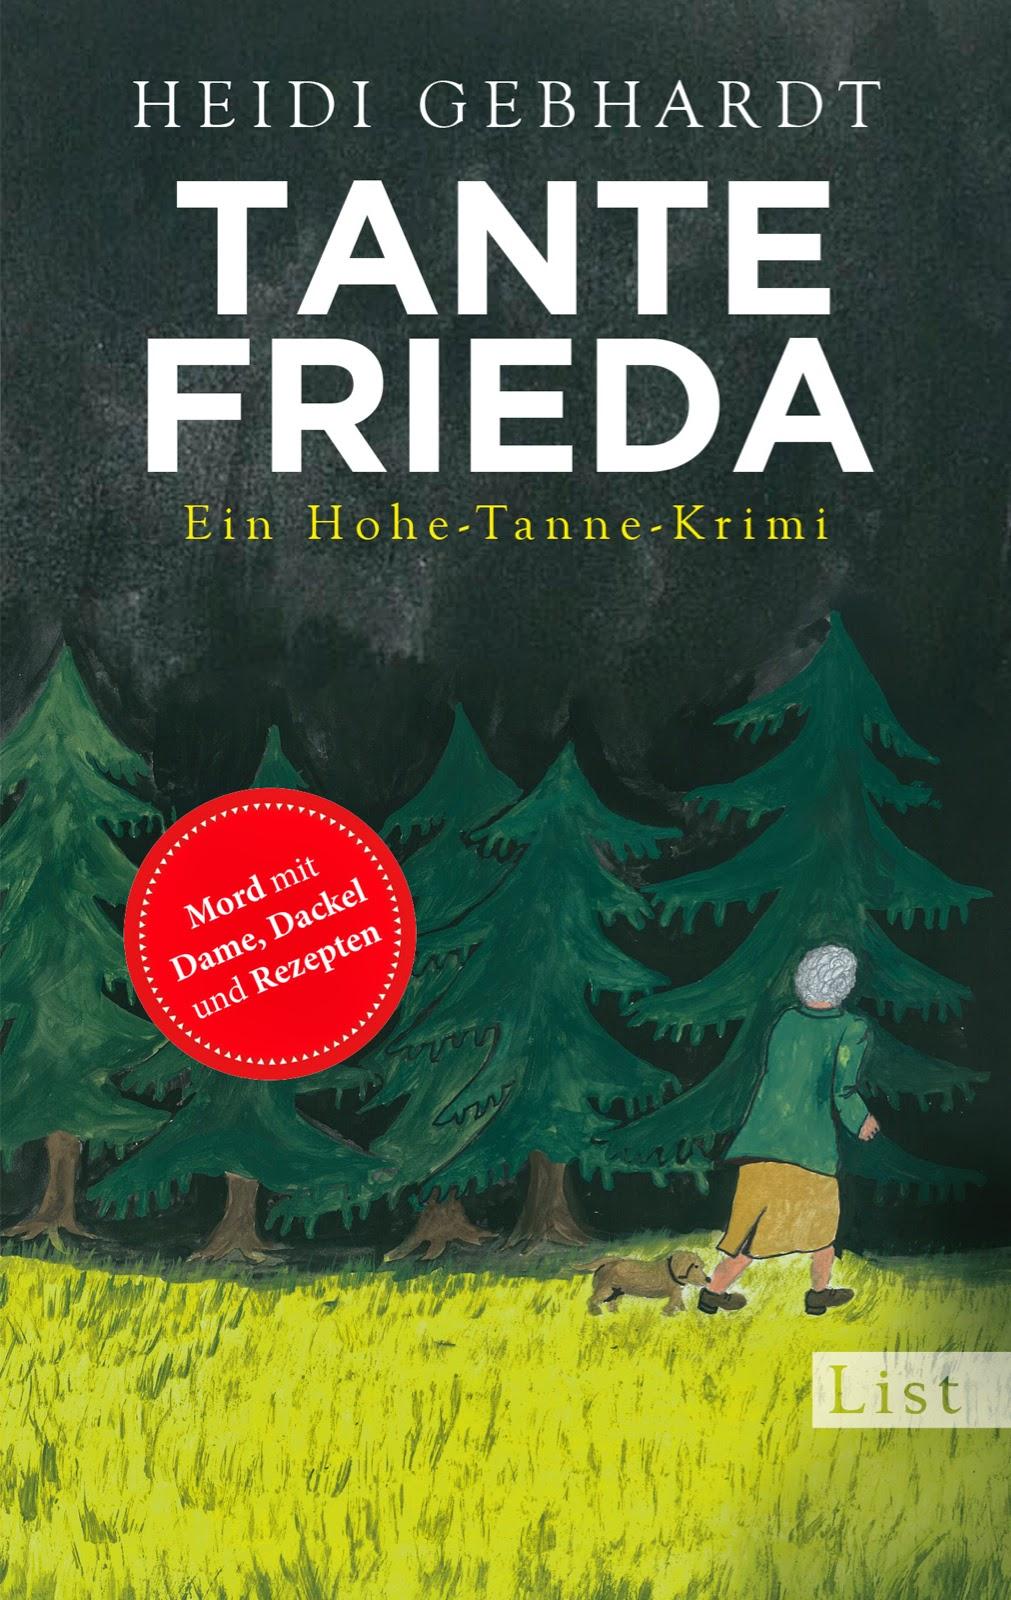 http://lasszeilensprechen.blogspot.com/2015/04/tante-frieda-heidi-gebhardt.html